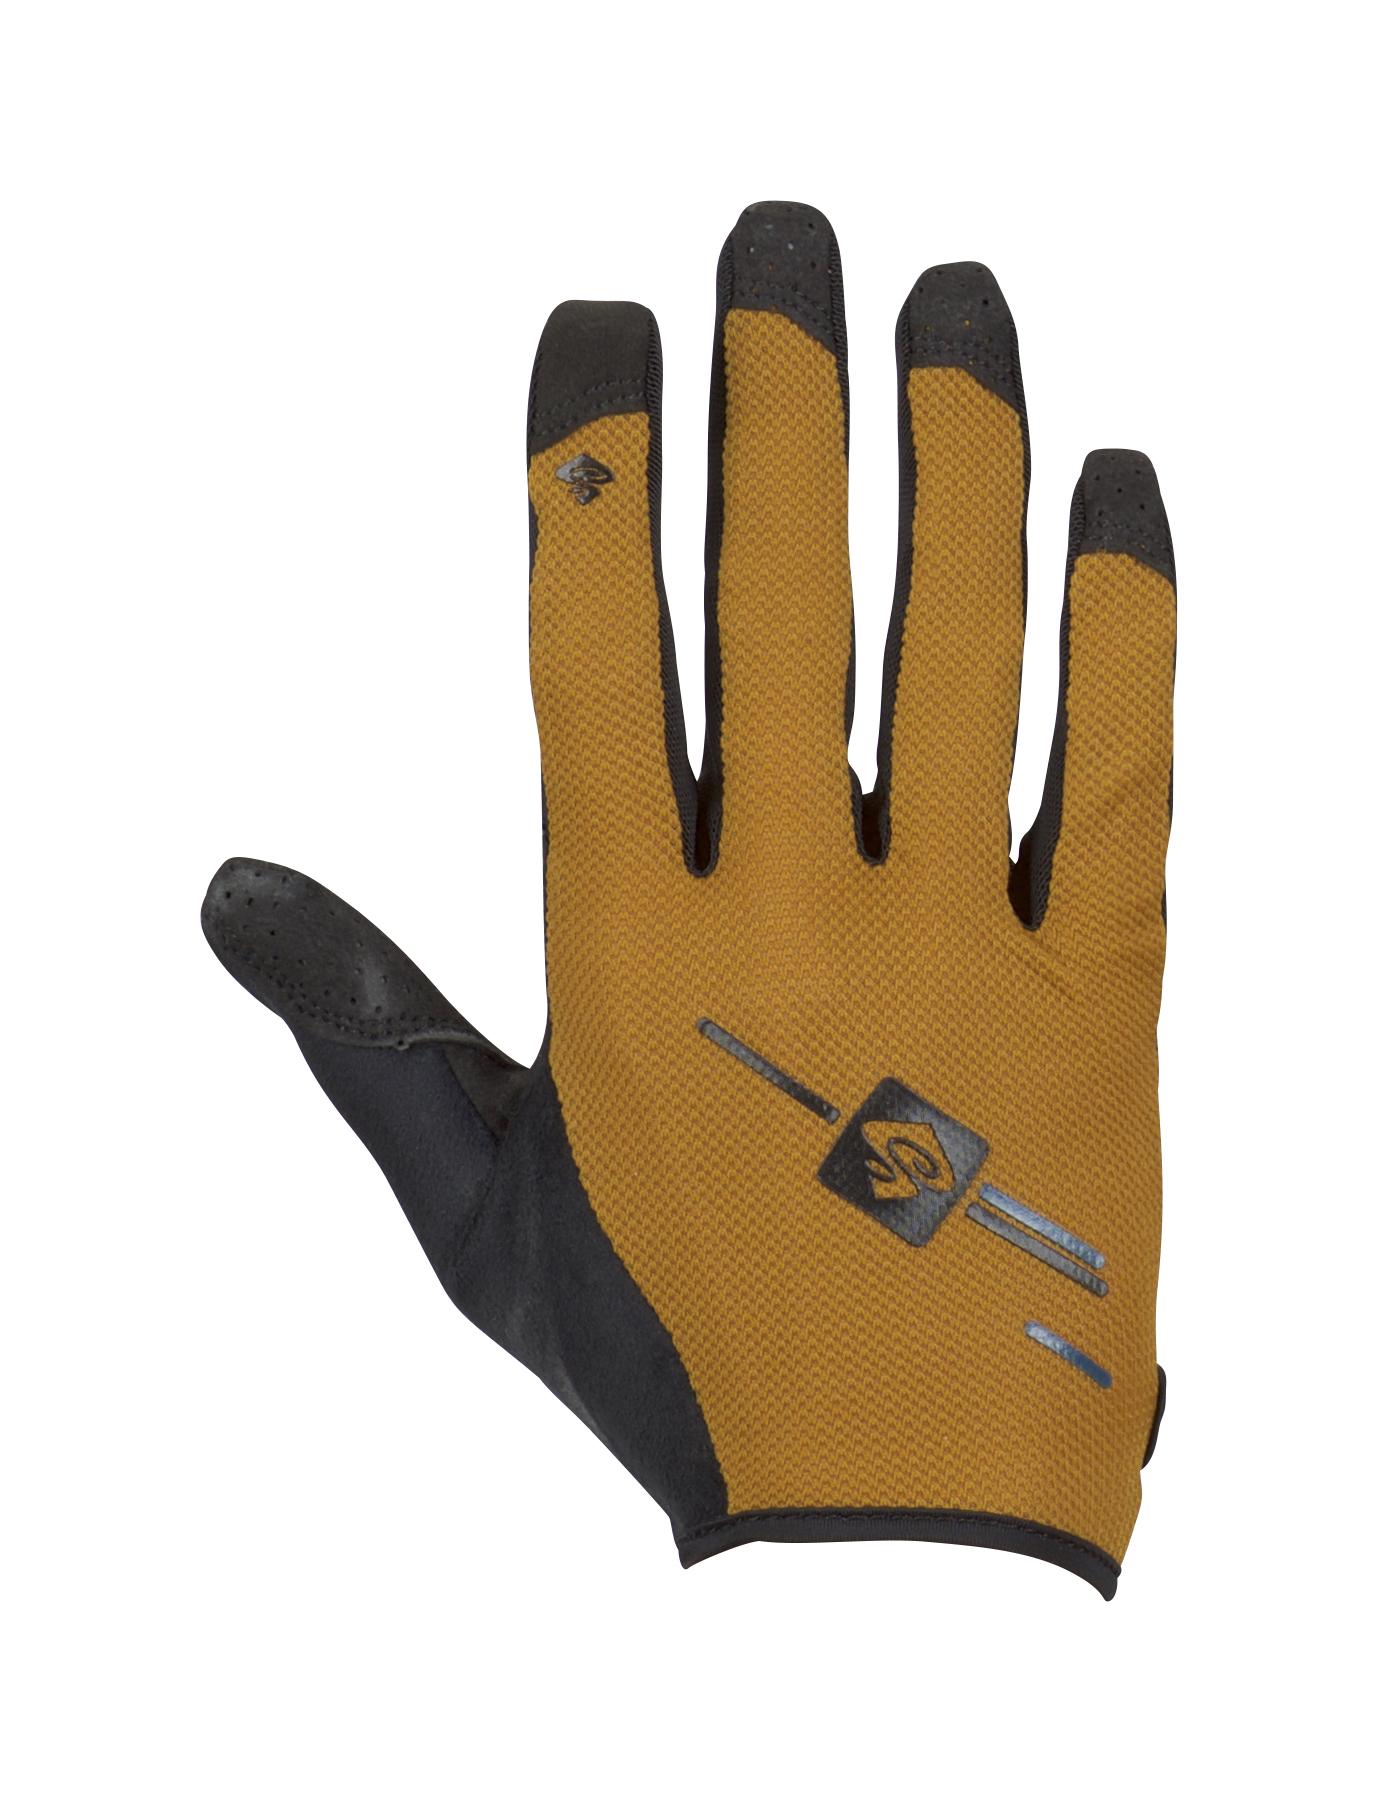 828054-hunter_light_gloves-brown_tundra-front.jpg